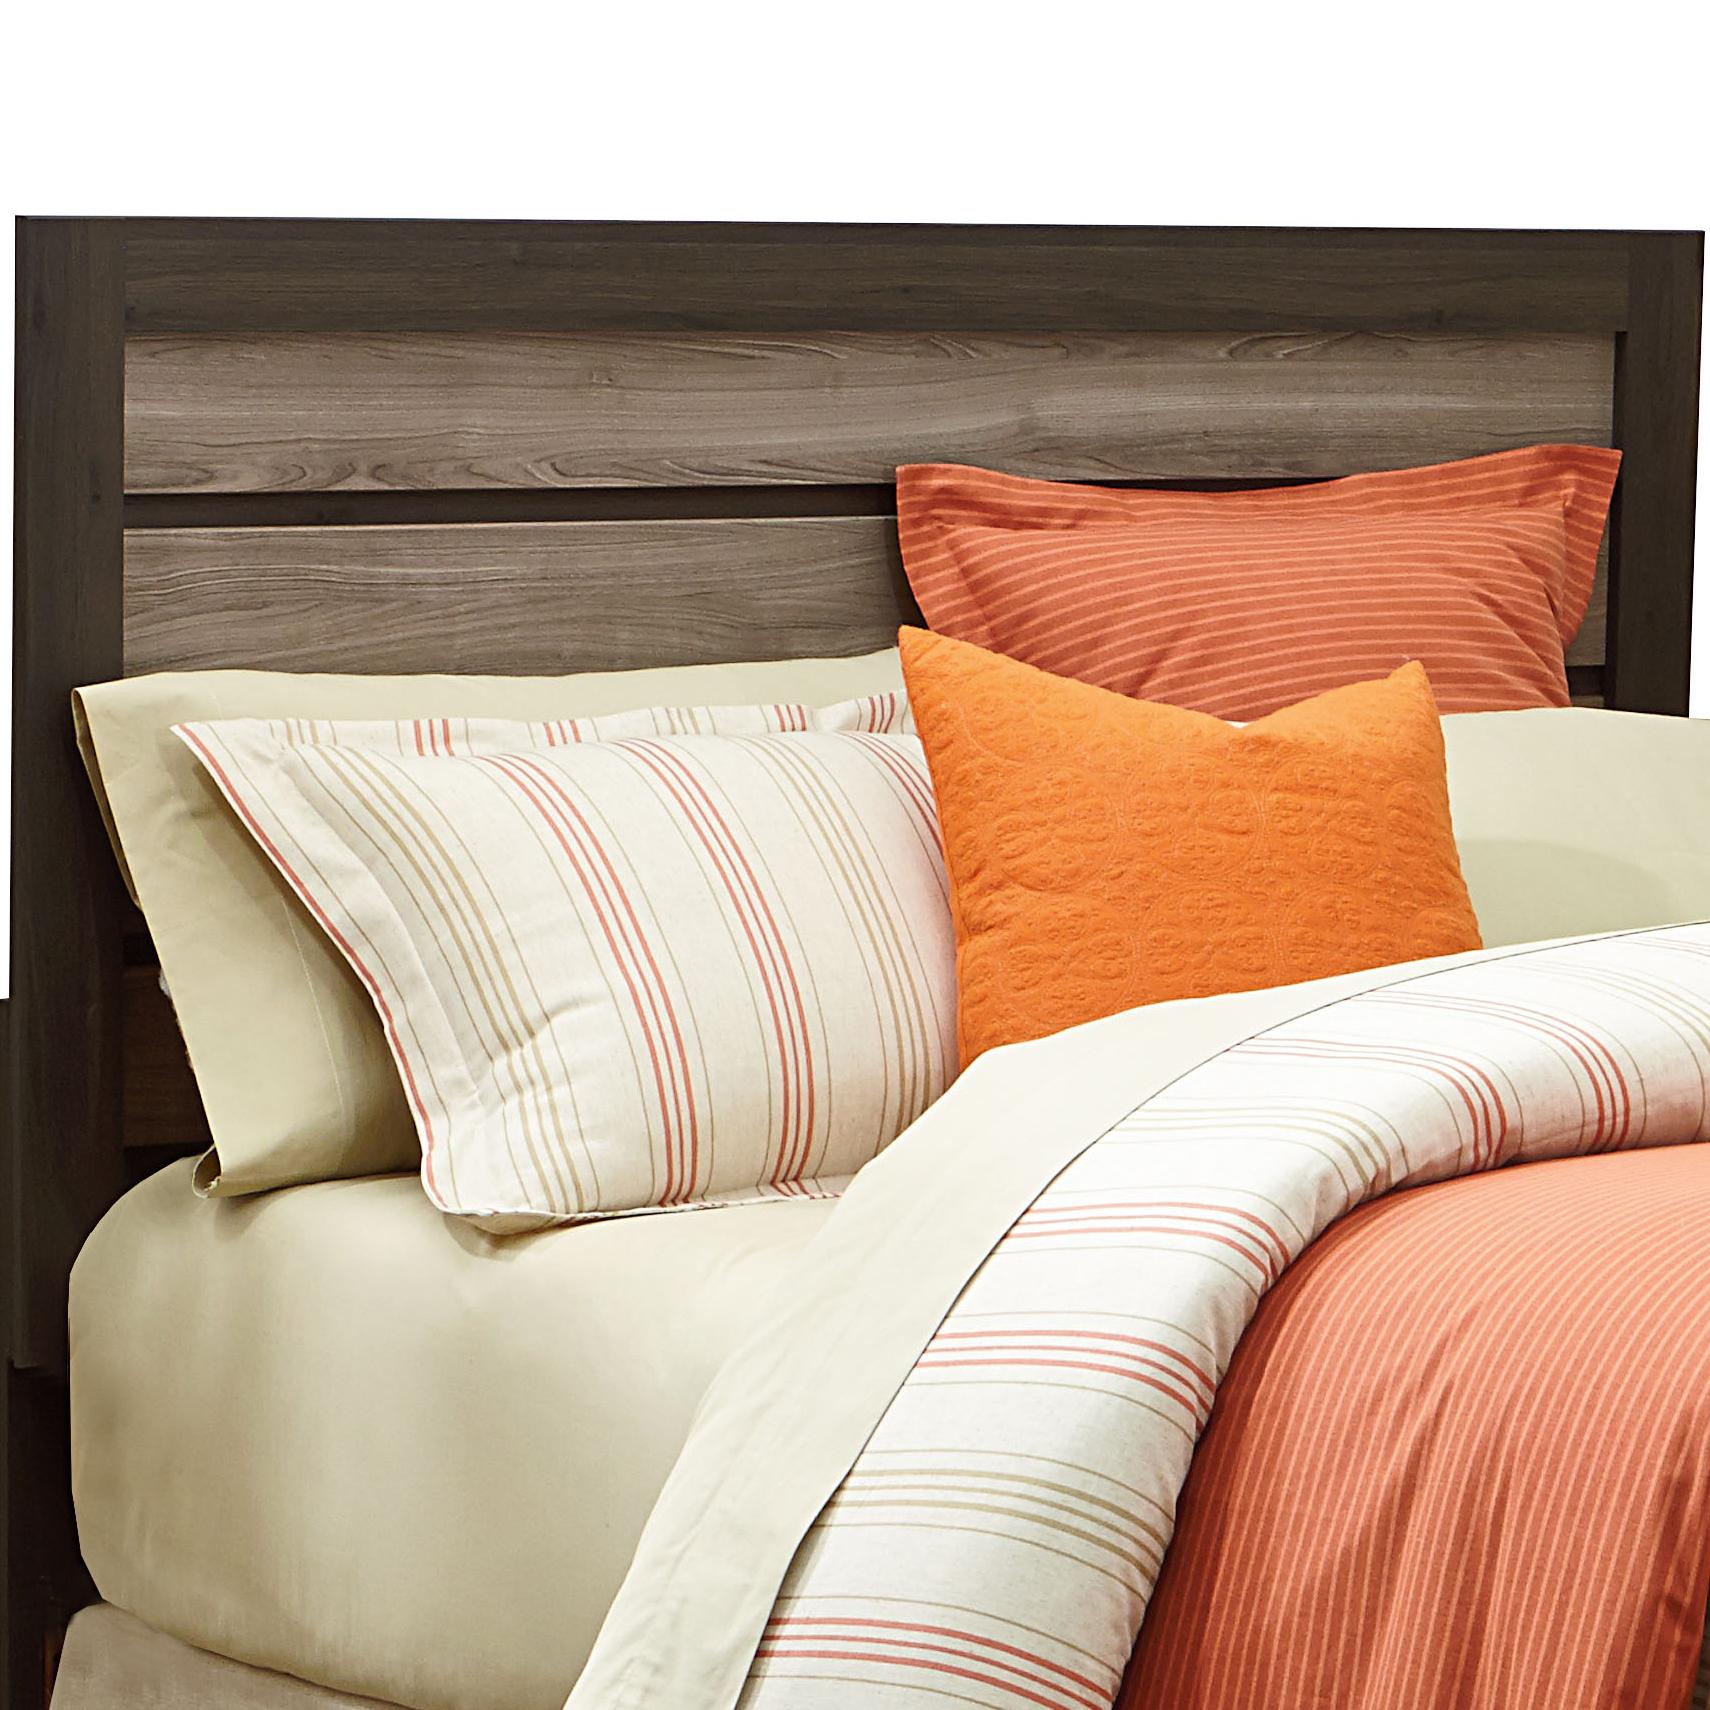 Standard Furniture Freemont King Headboard - Item Number: 69766